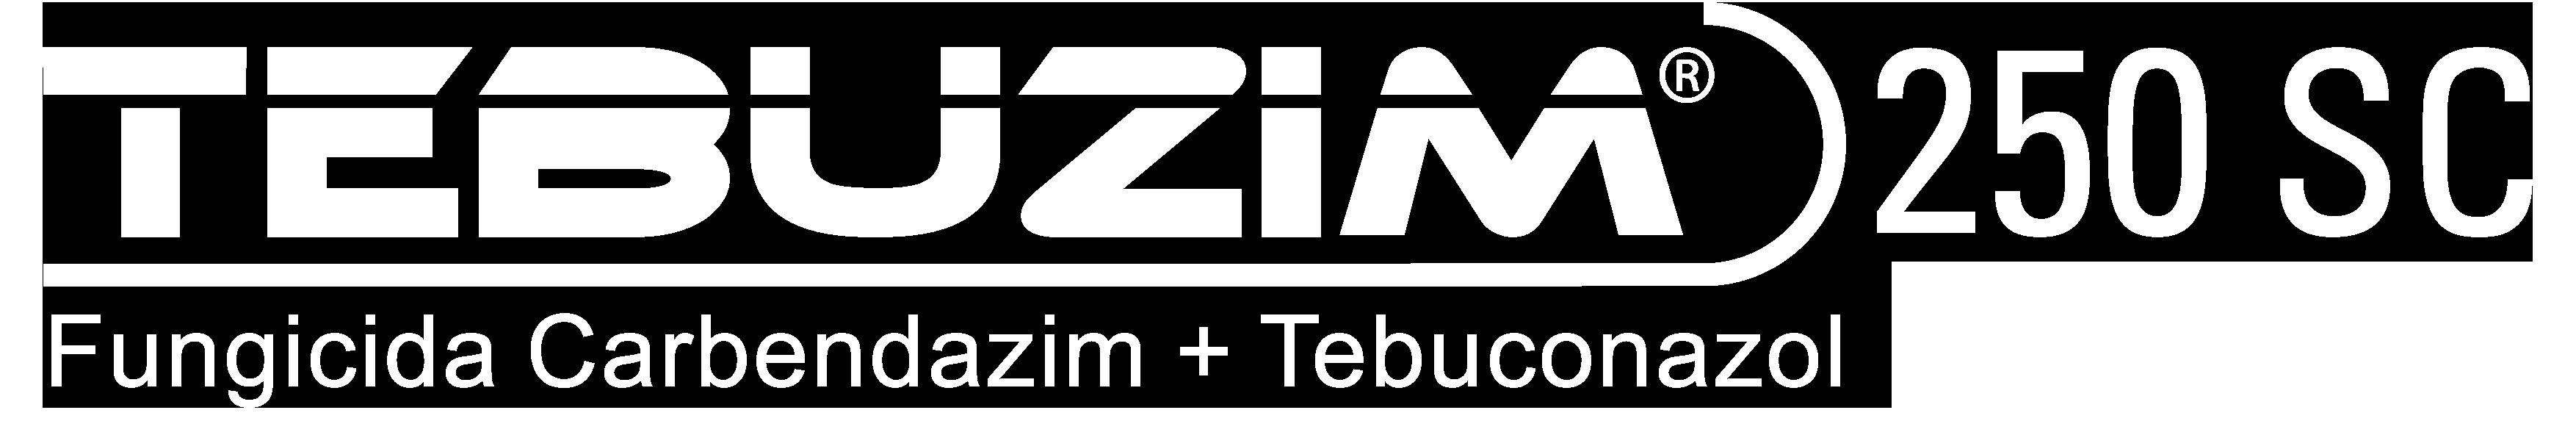 RTM_Brazil_ProductLogo_White_Tebuzim_250_SC